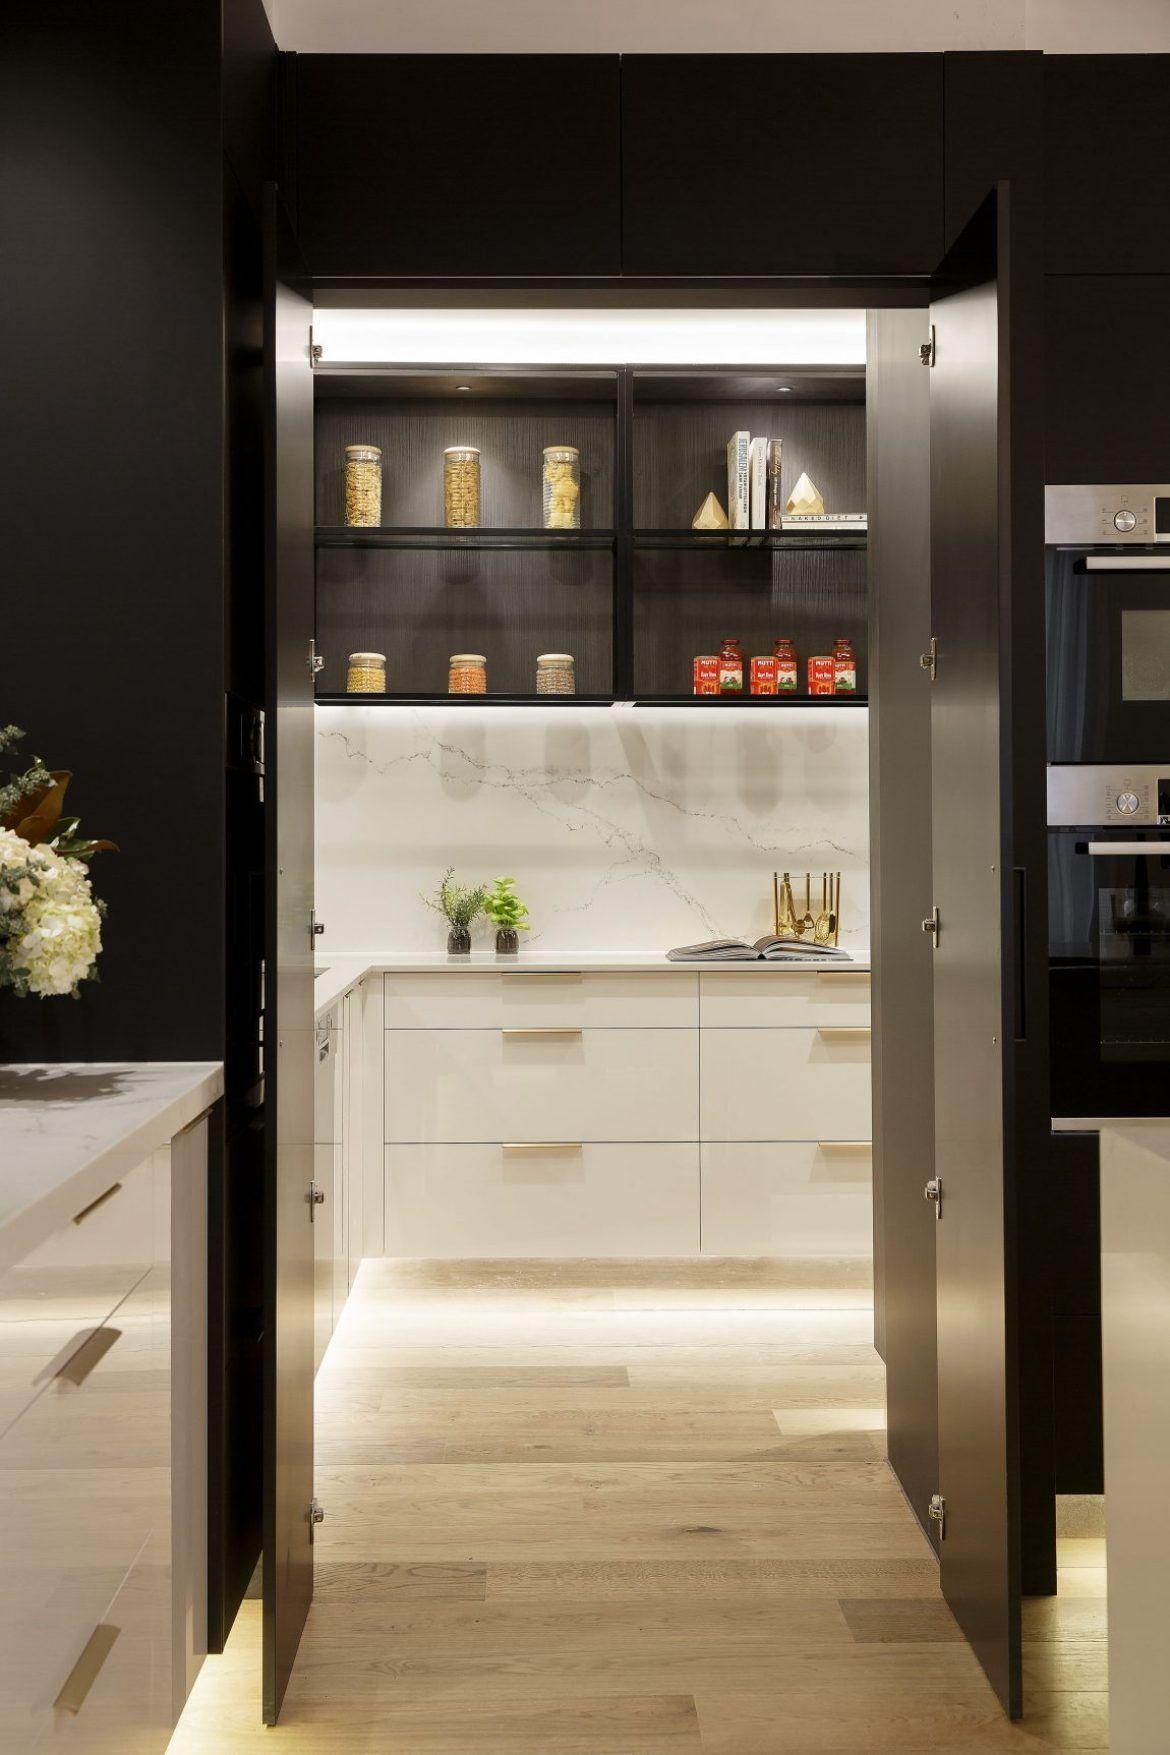 Hayden and Sara's modern kitchen has a generous butlers